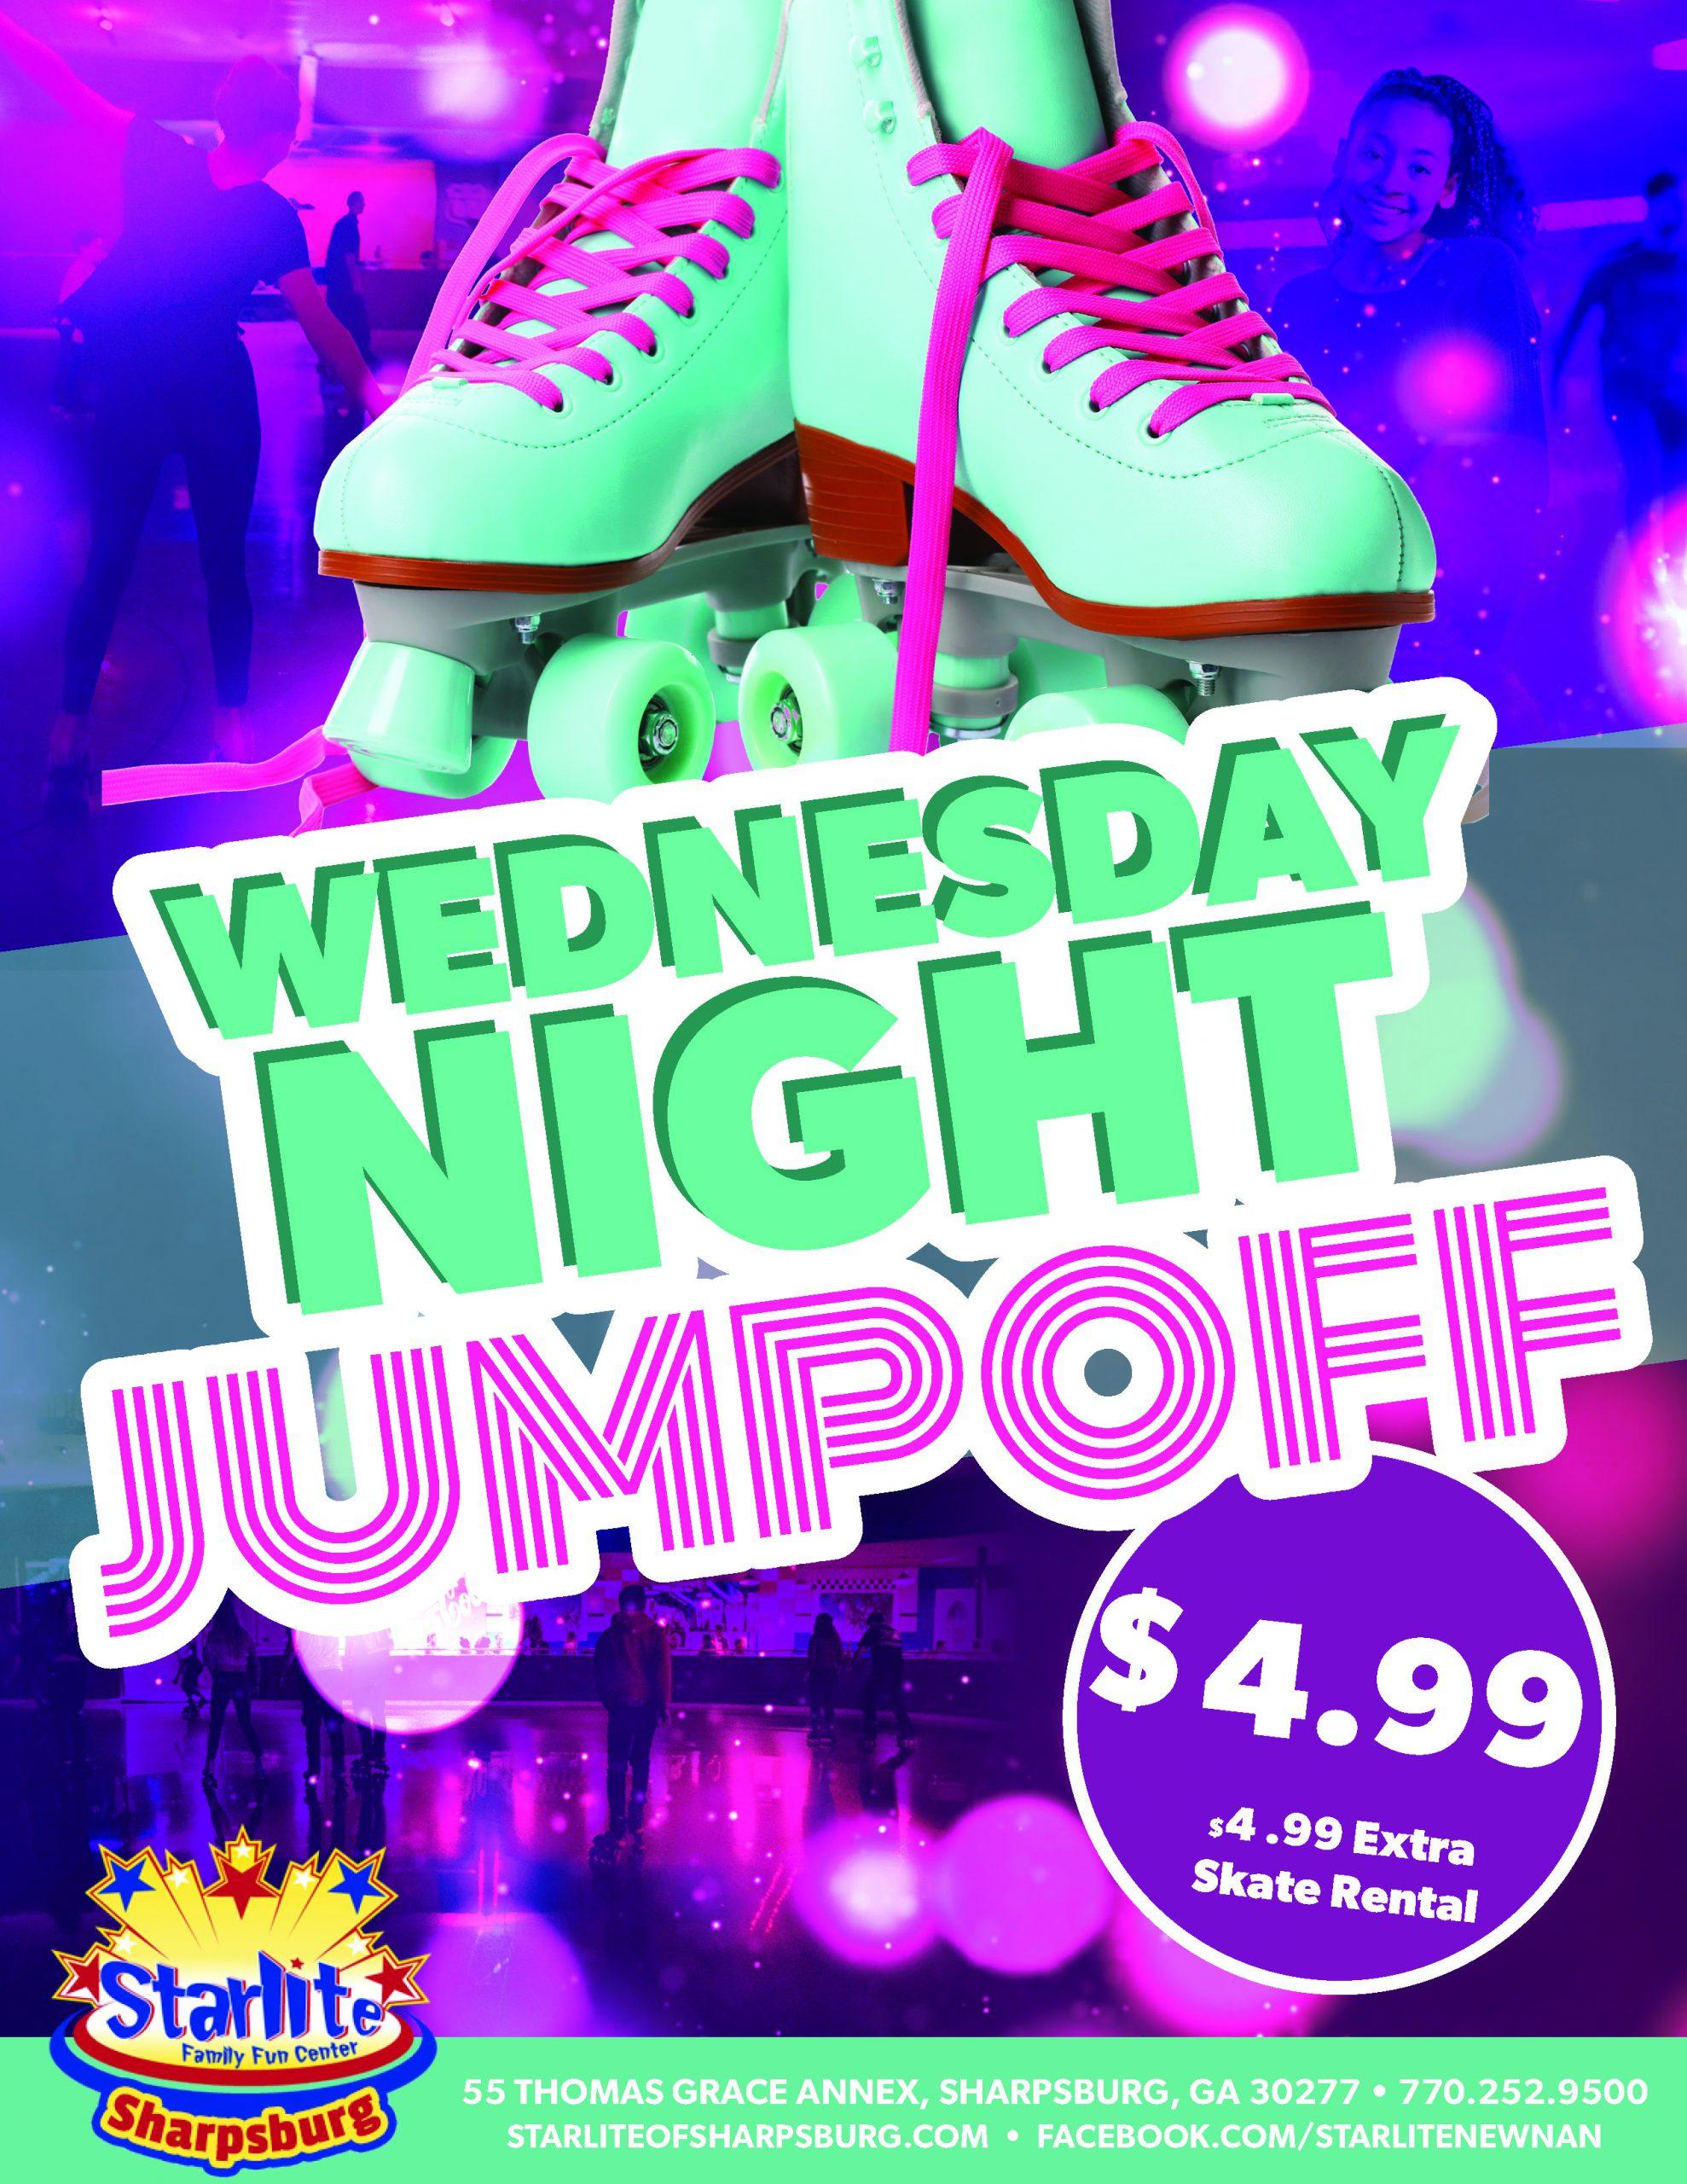 GA21-007 Wednesday Night Jumpoff-Sharpsburg 4.99